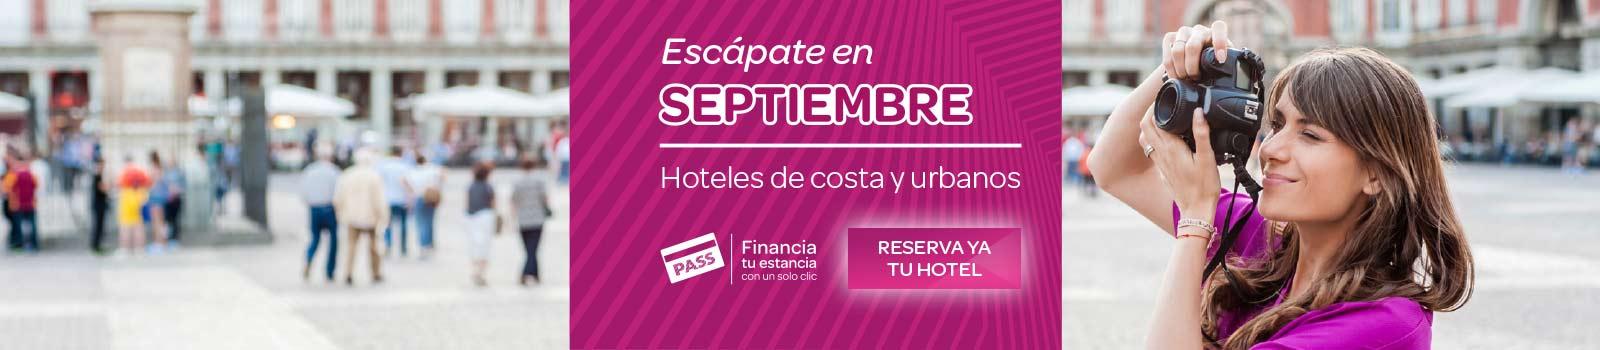 Ofertas Hoteles Septiembre